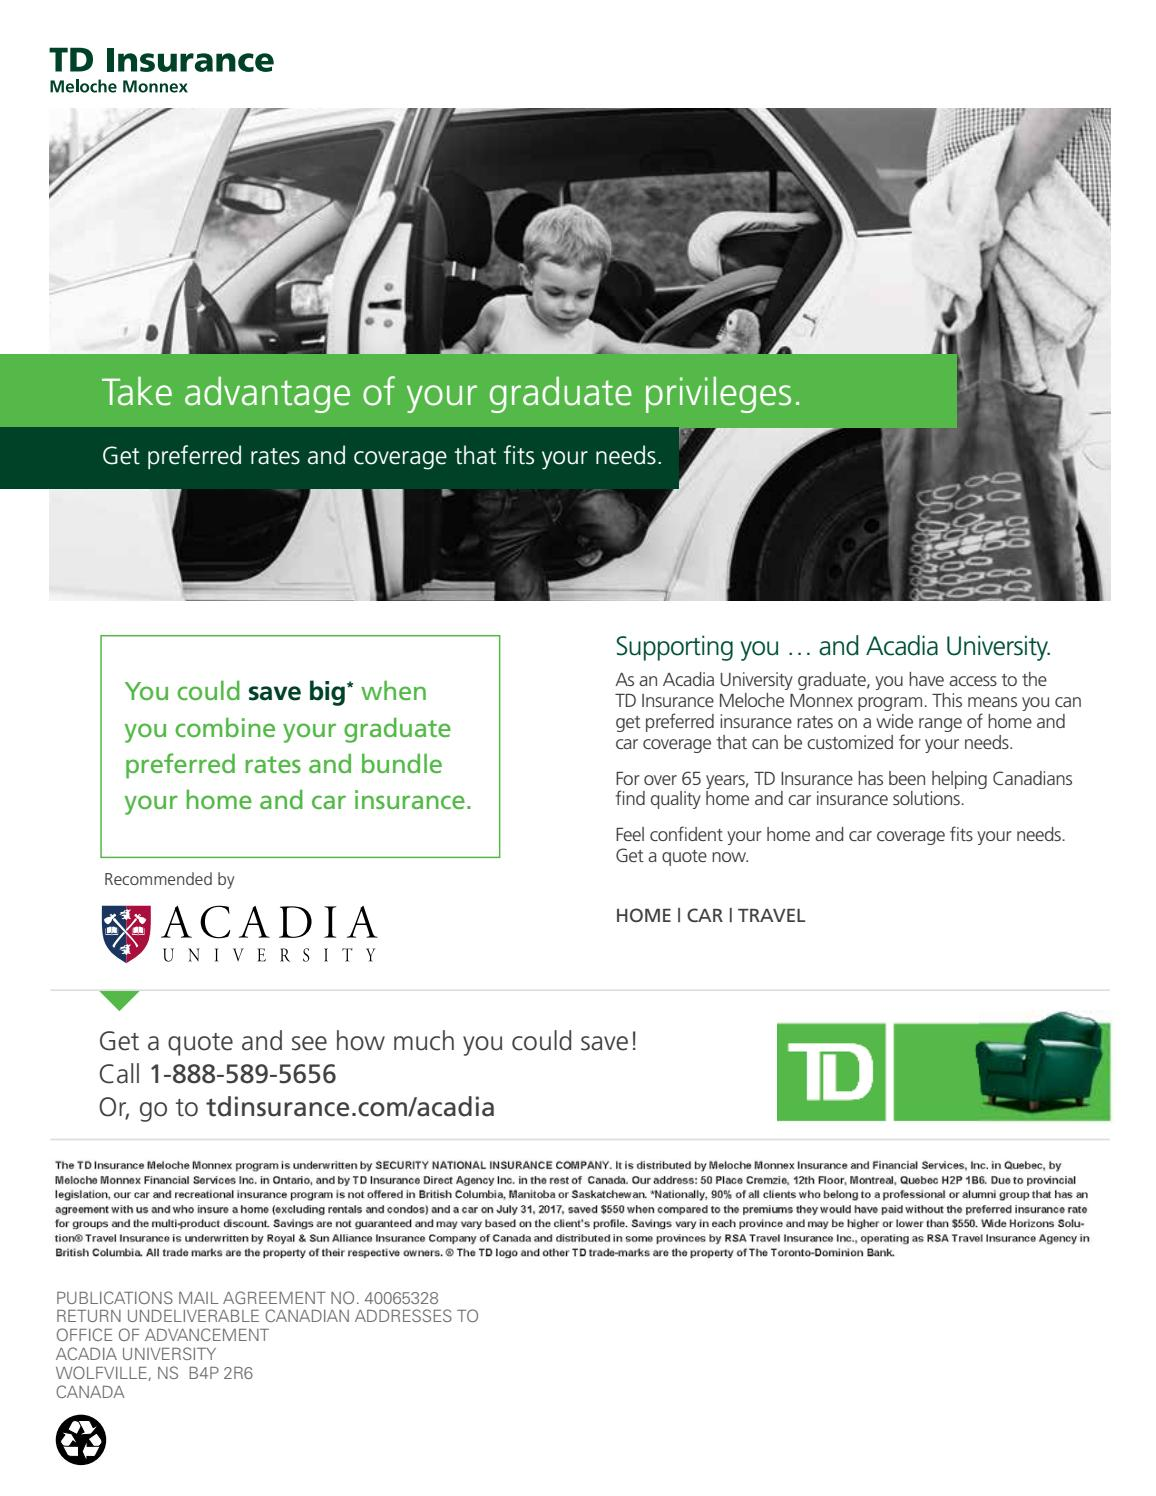 Acadia Bulletin - Spring 2019 by Acadia University - Issuu